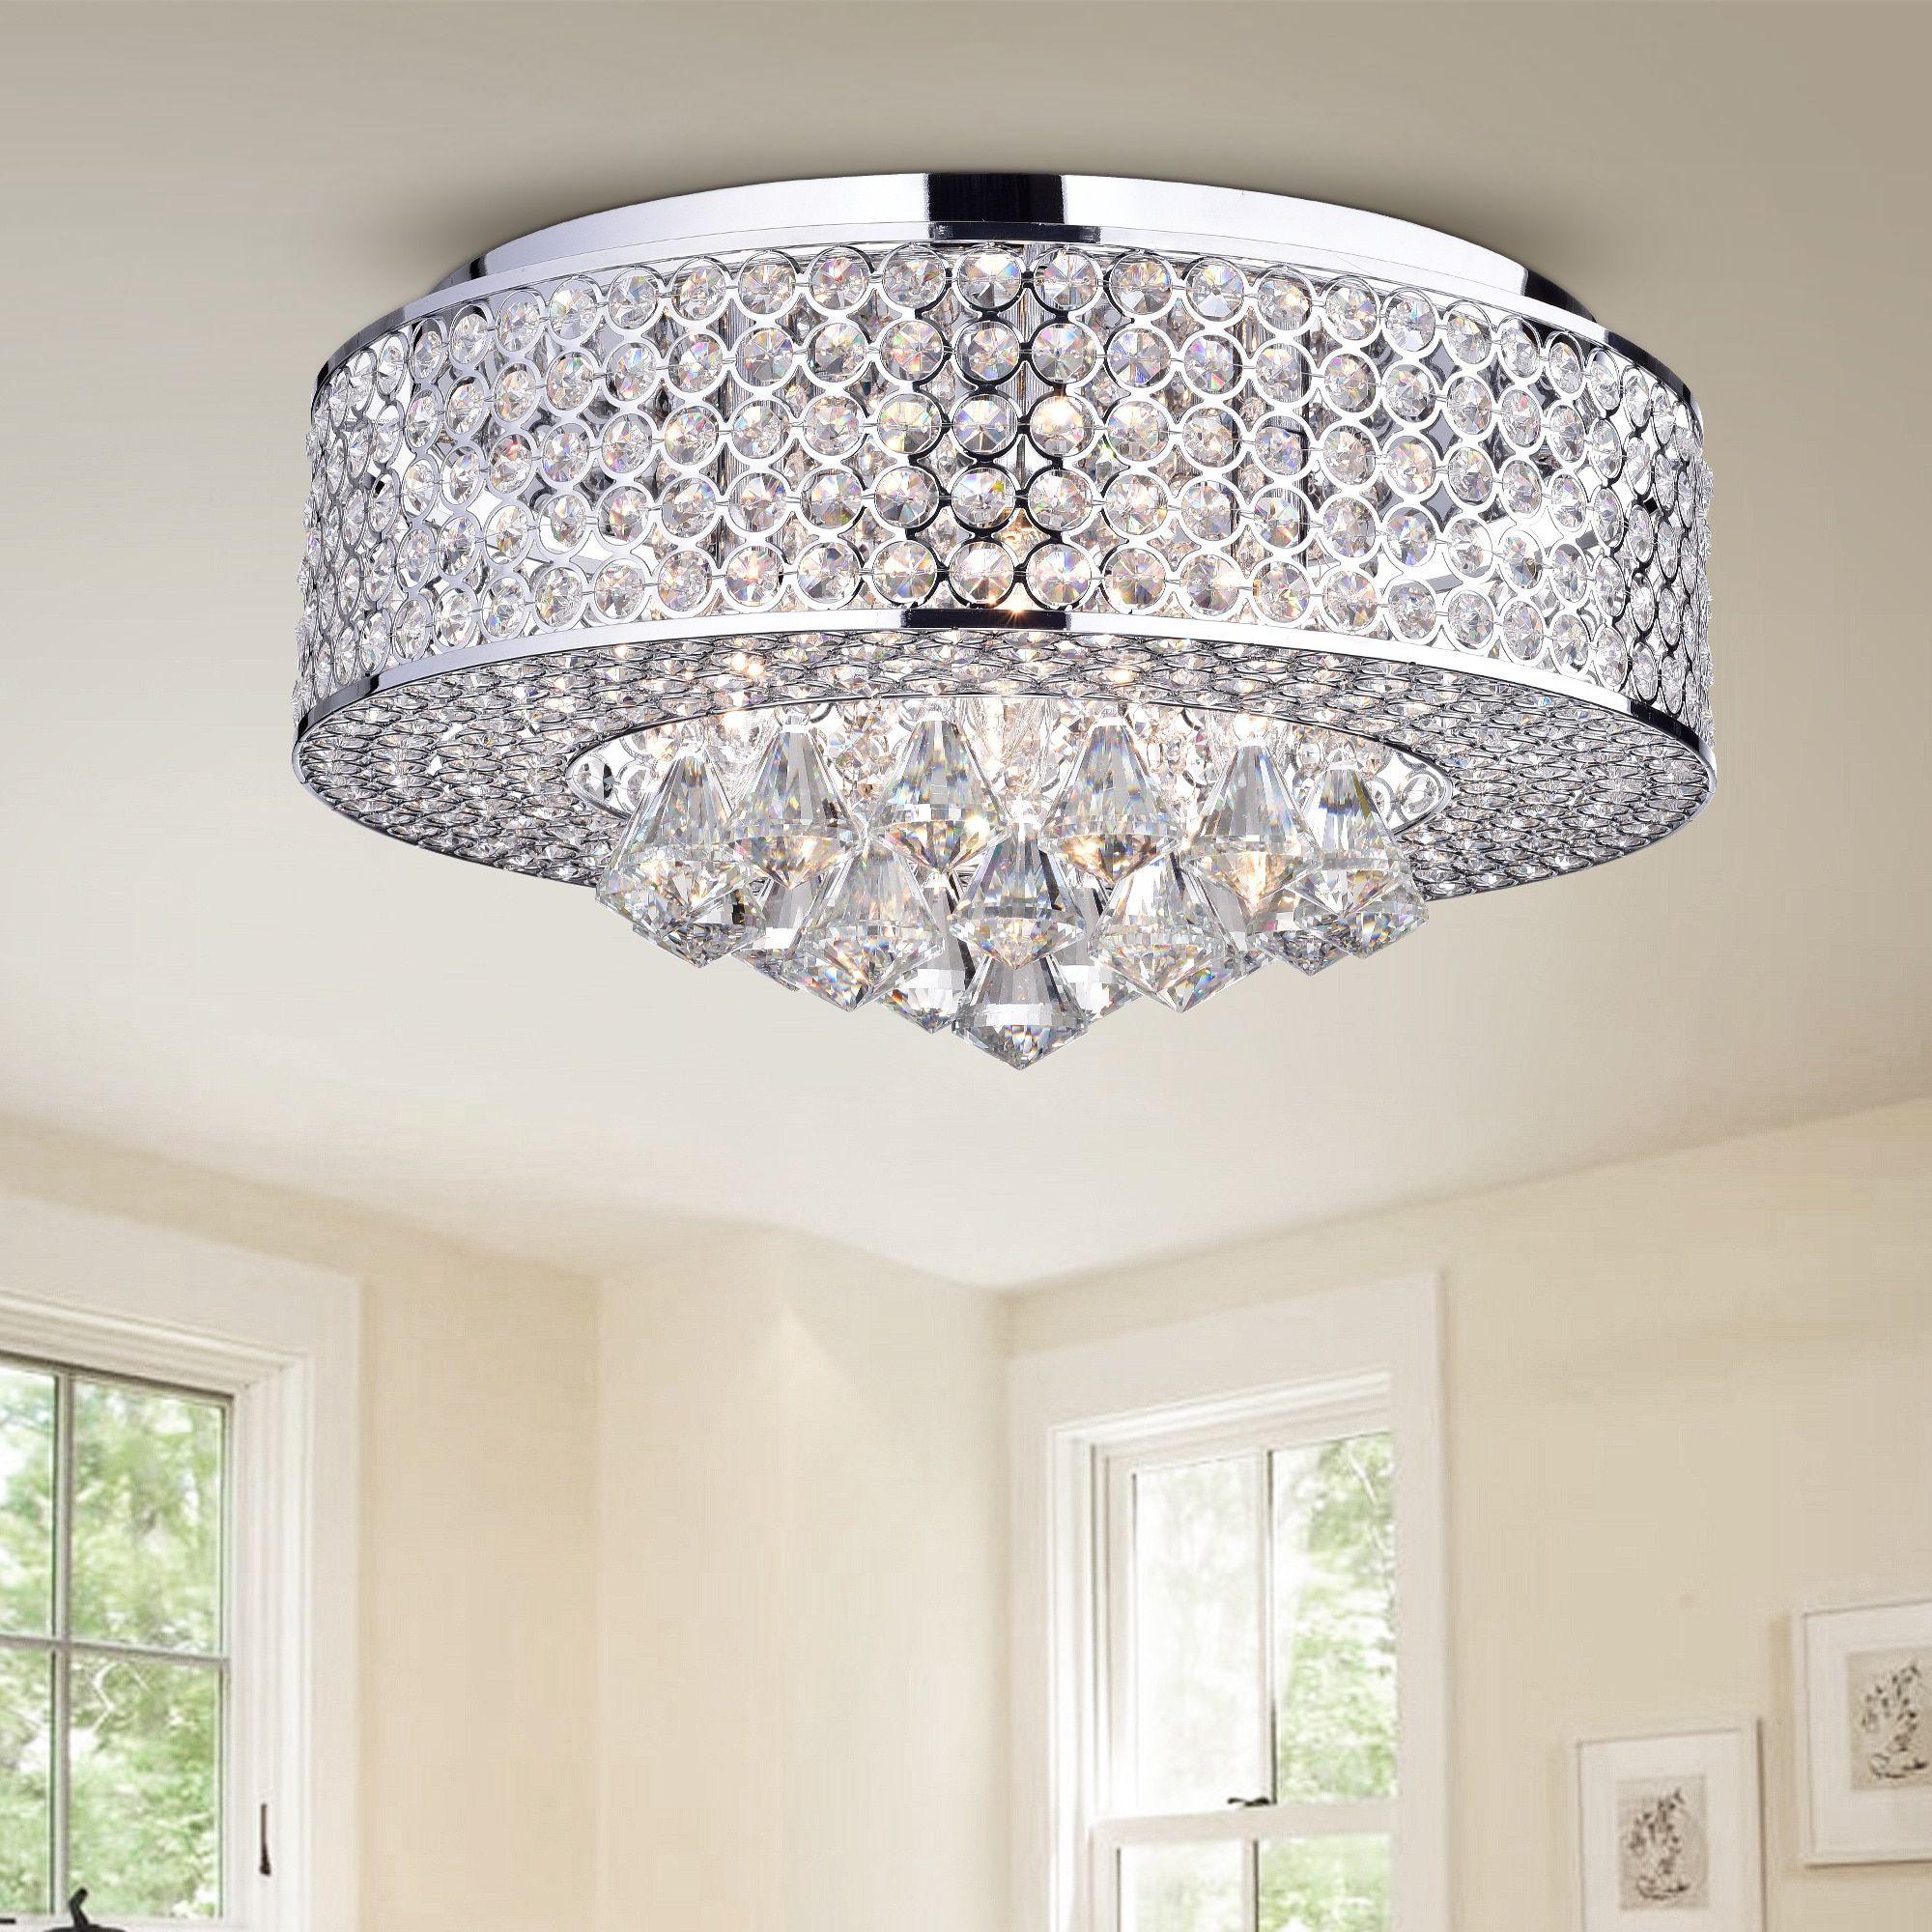 Warehouse of tiffany wendu chrome inch round crystal lamp chrome